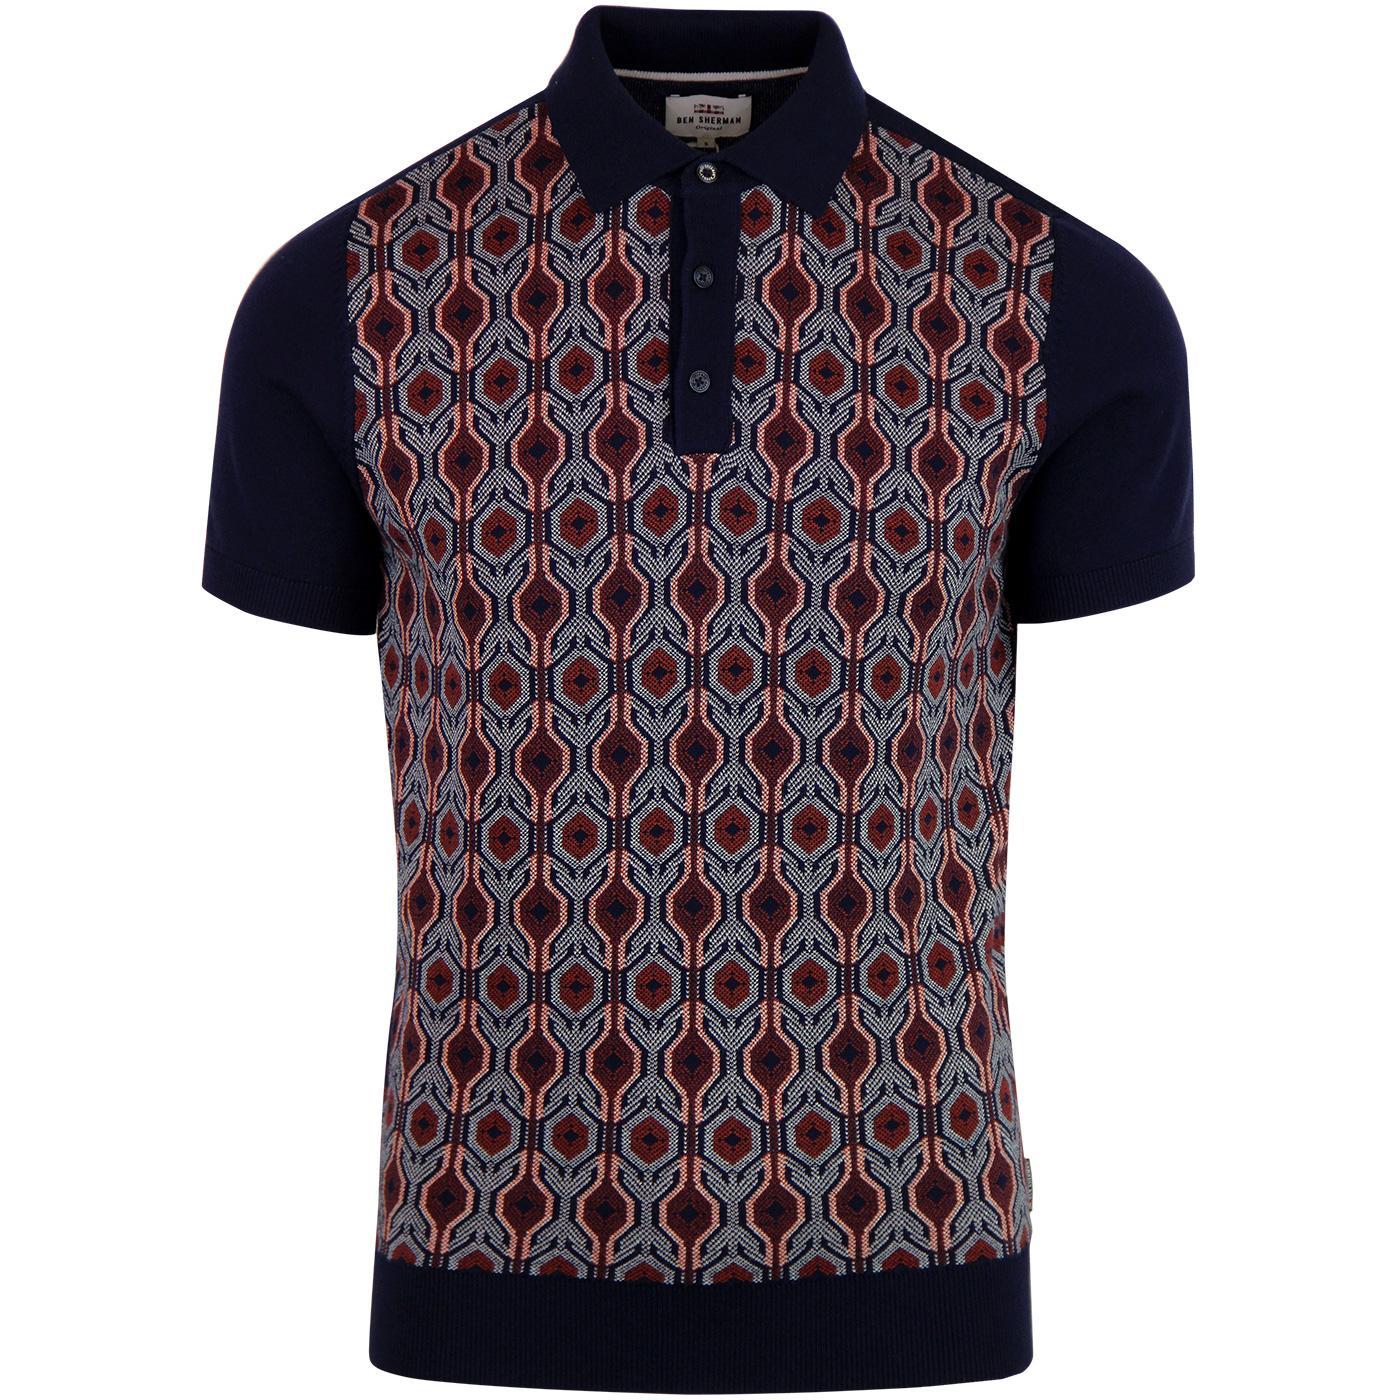 BEN SHERMAN Mod Birdseye Jacquard Knitted Polo